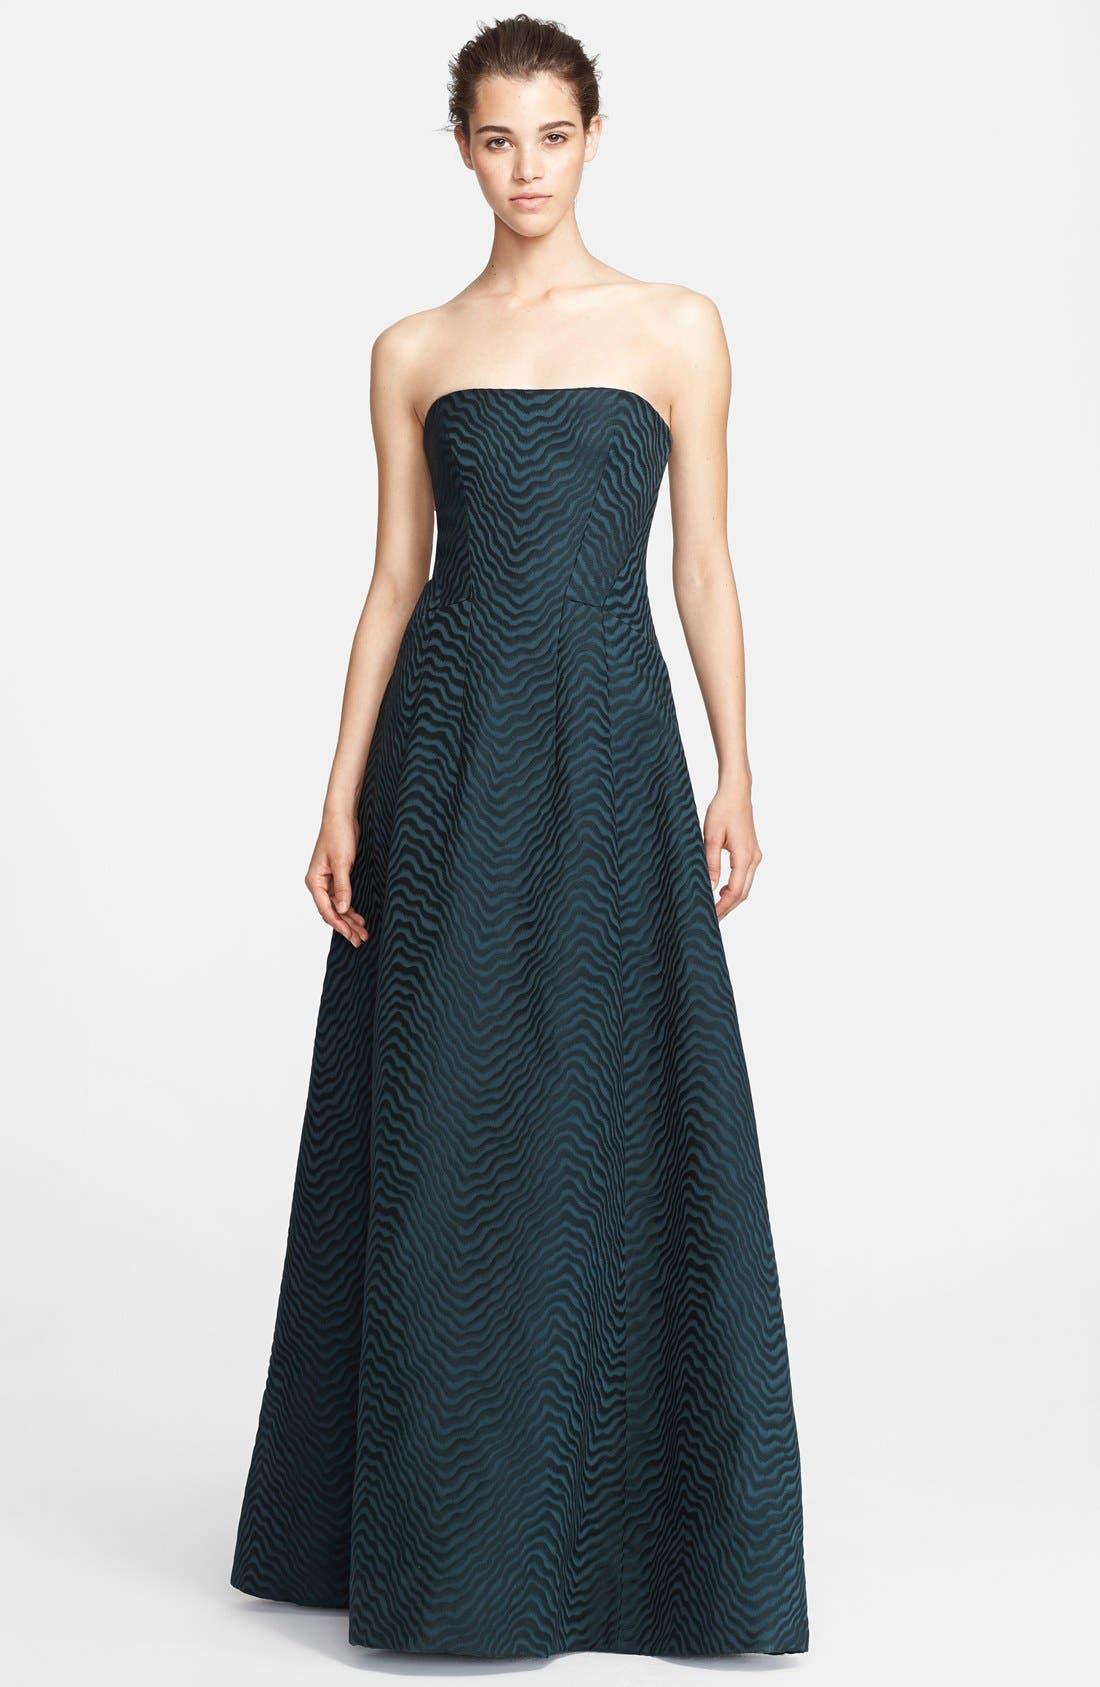 Main Image - Jason Wu Jacquard Strapless A-Line Gown